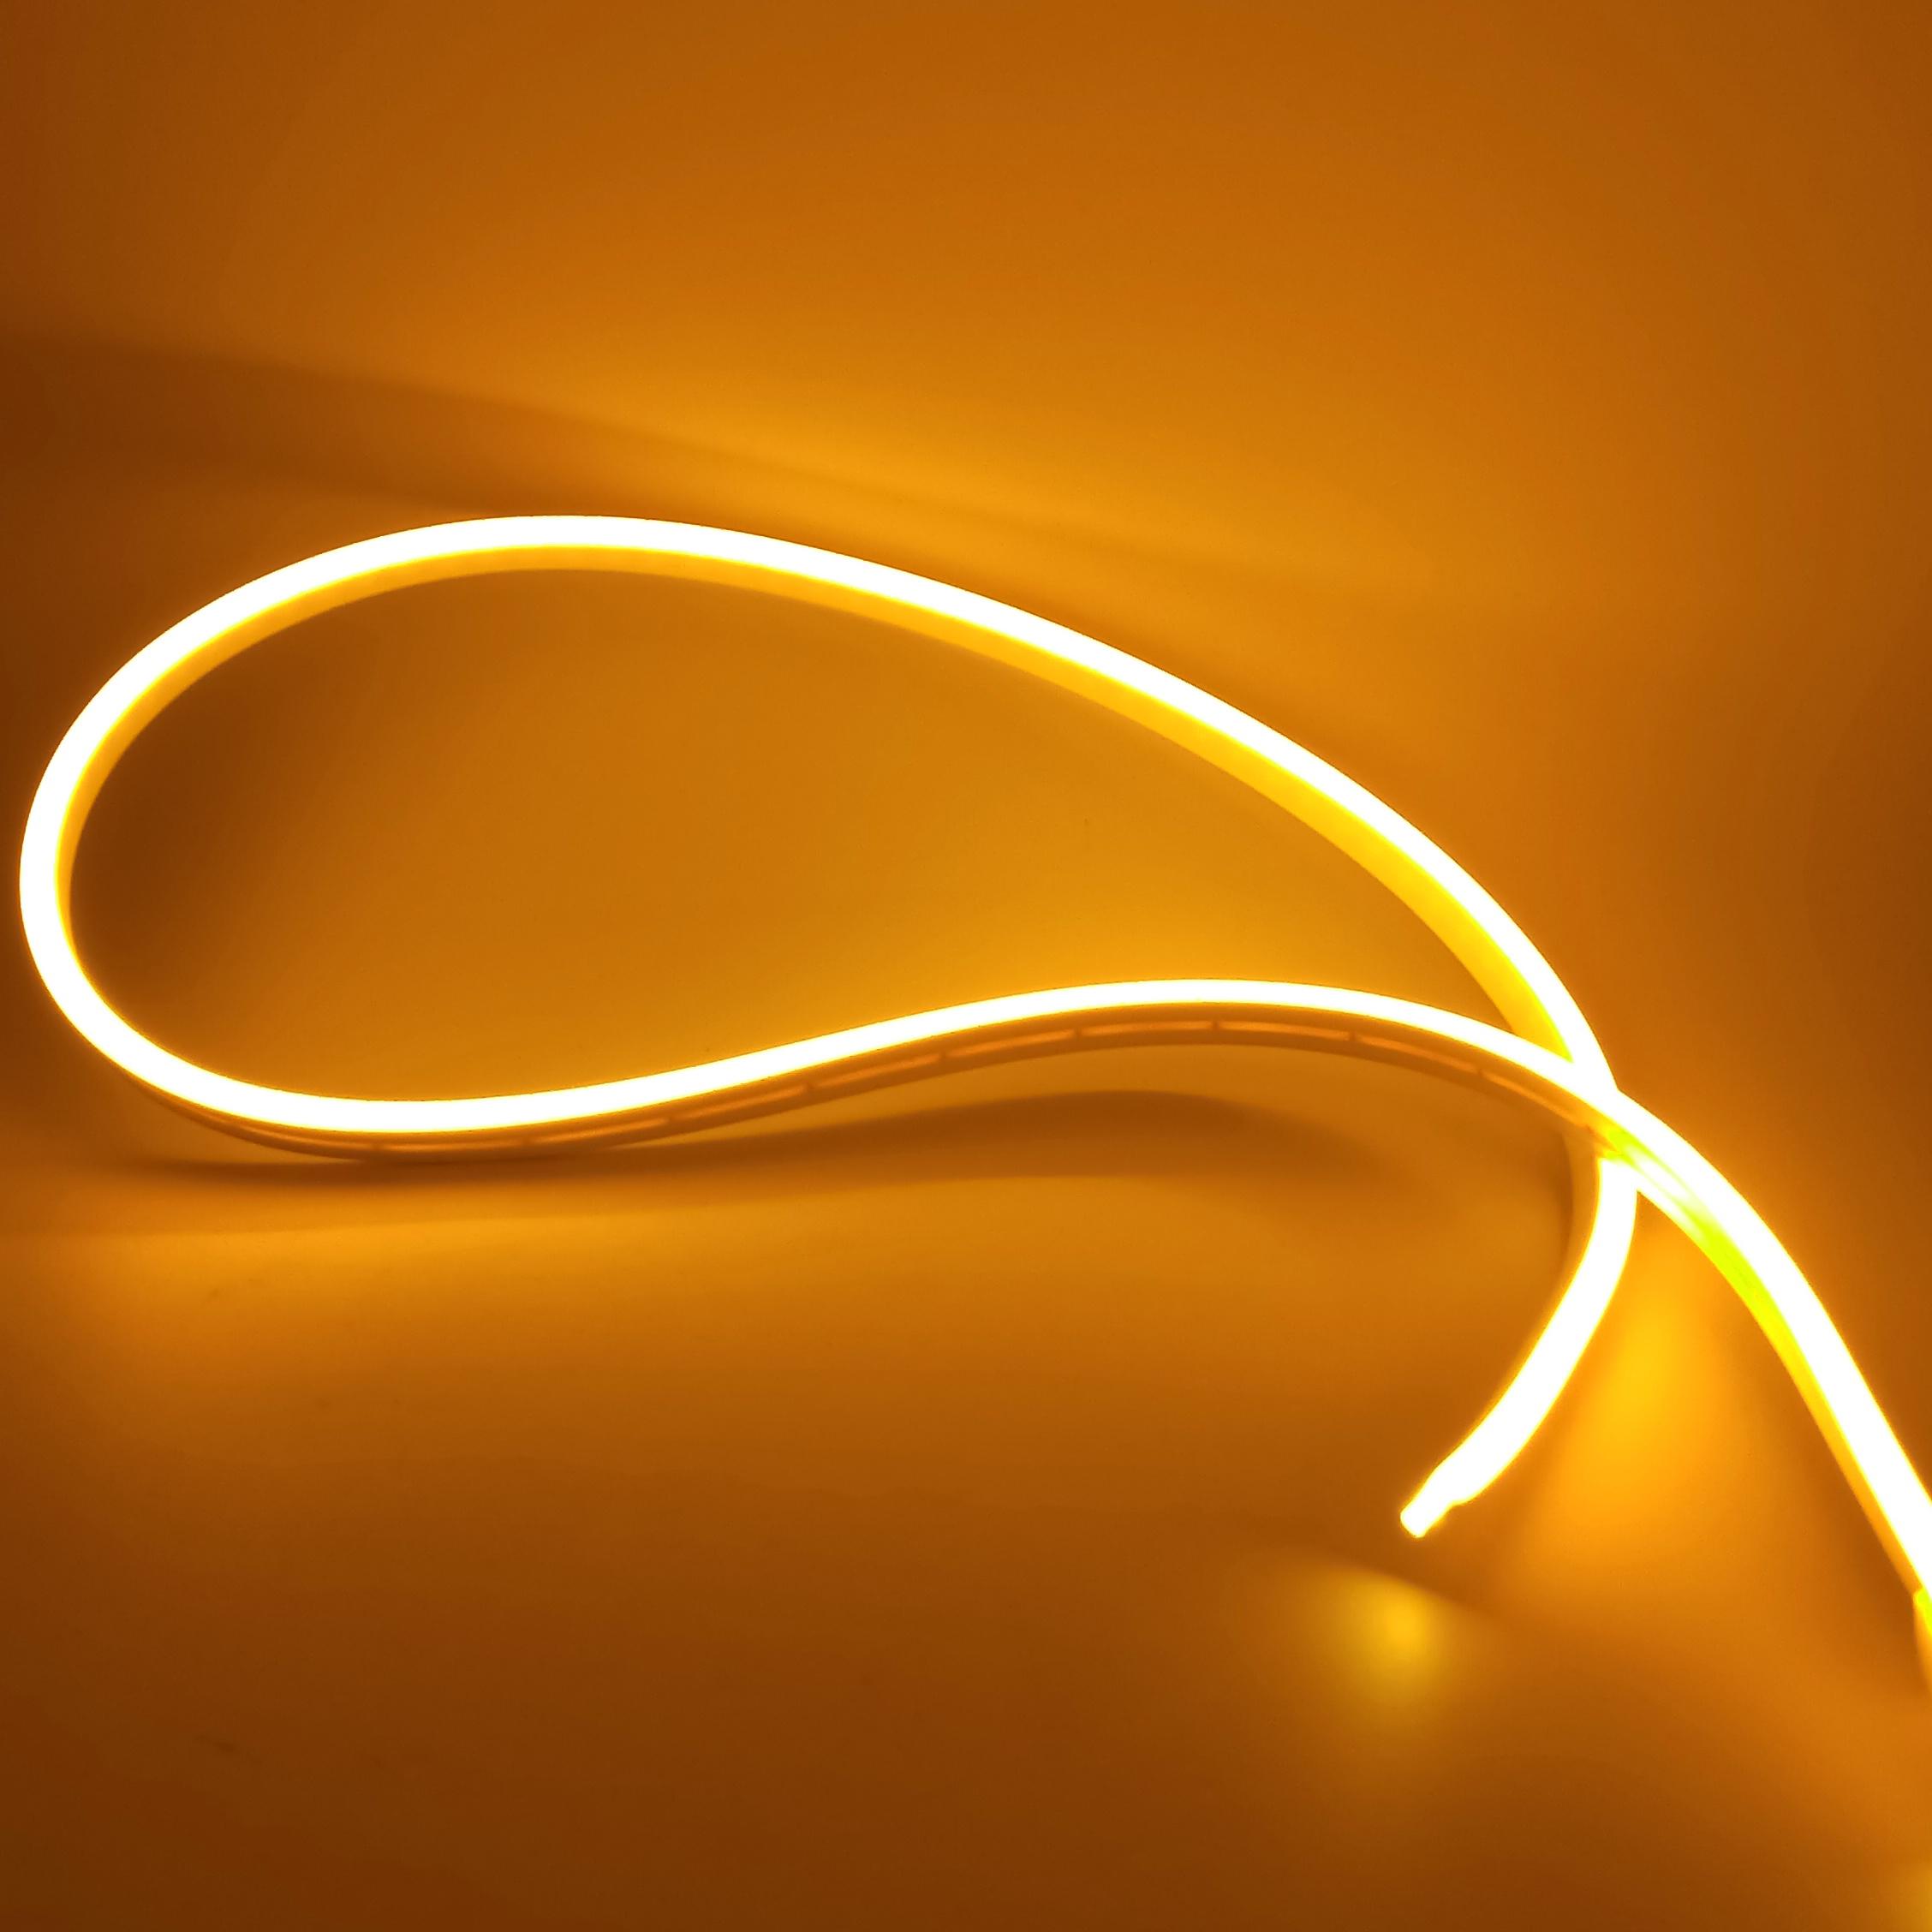 "Cветодиодный неон PROLUM Silicone 2835 120 IP68 12V 6x12 - SERIES ""SM"" PRO Жёлтый"